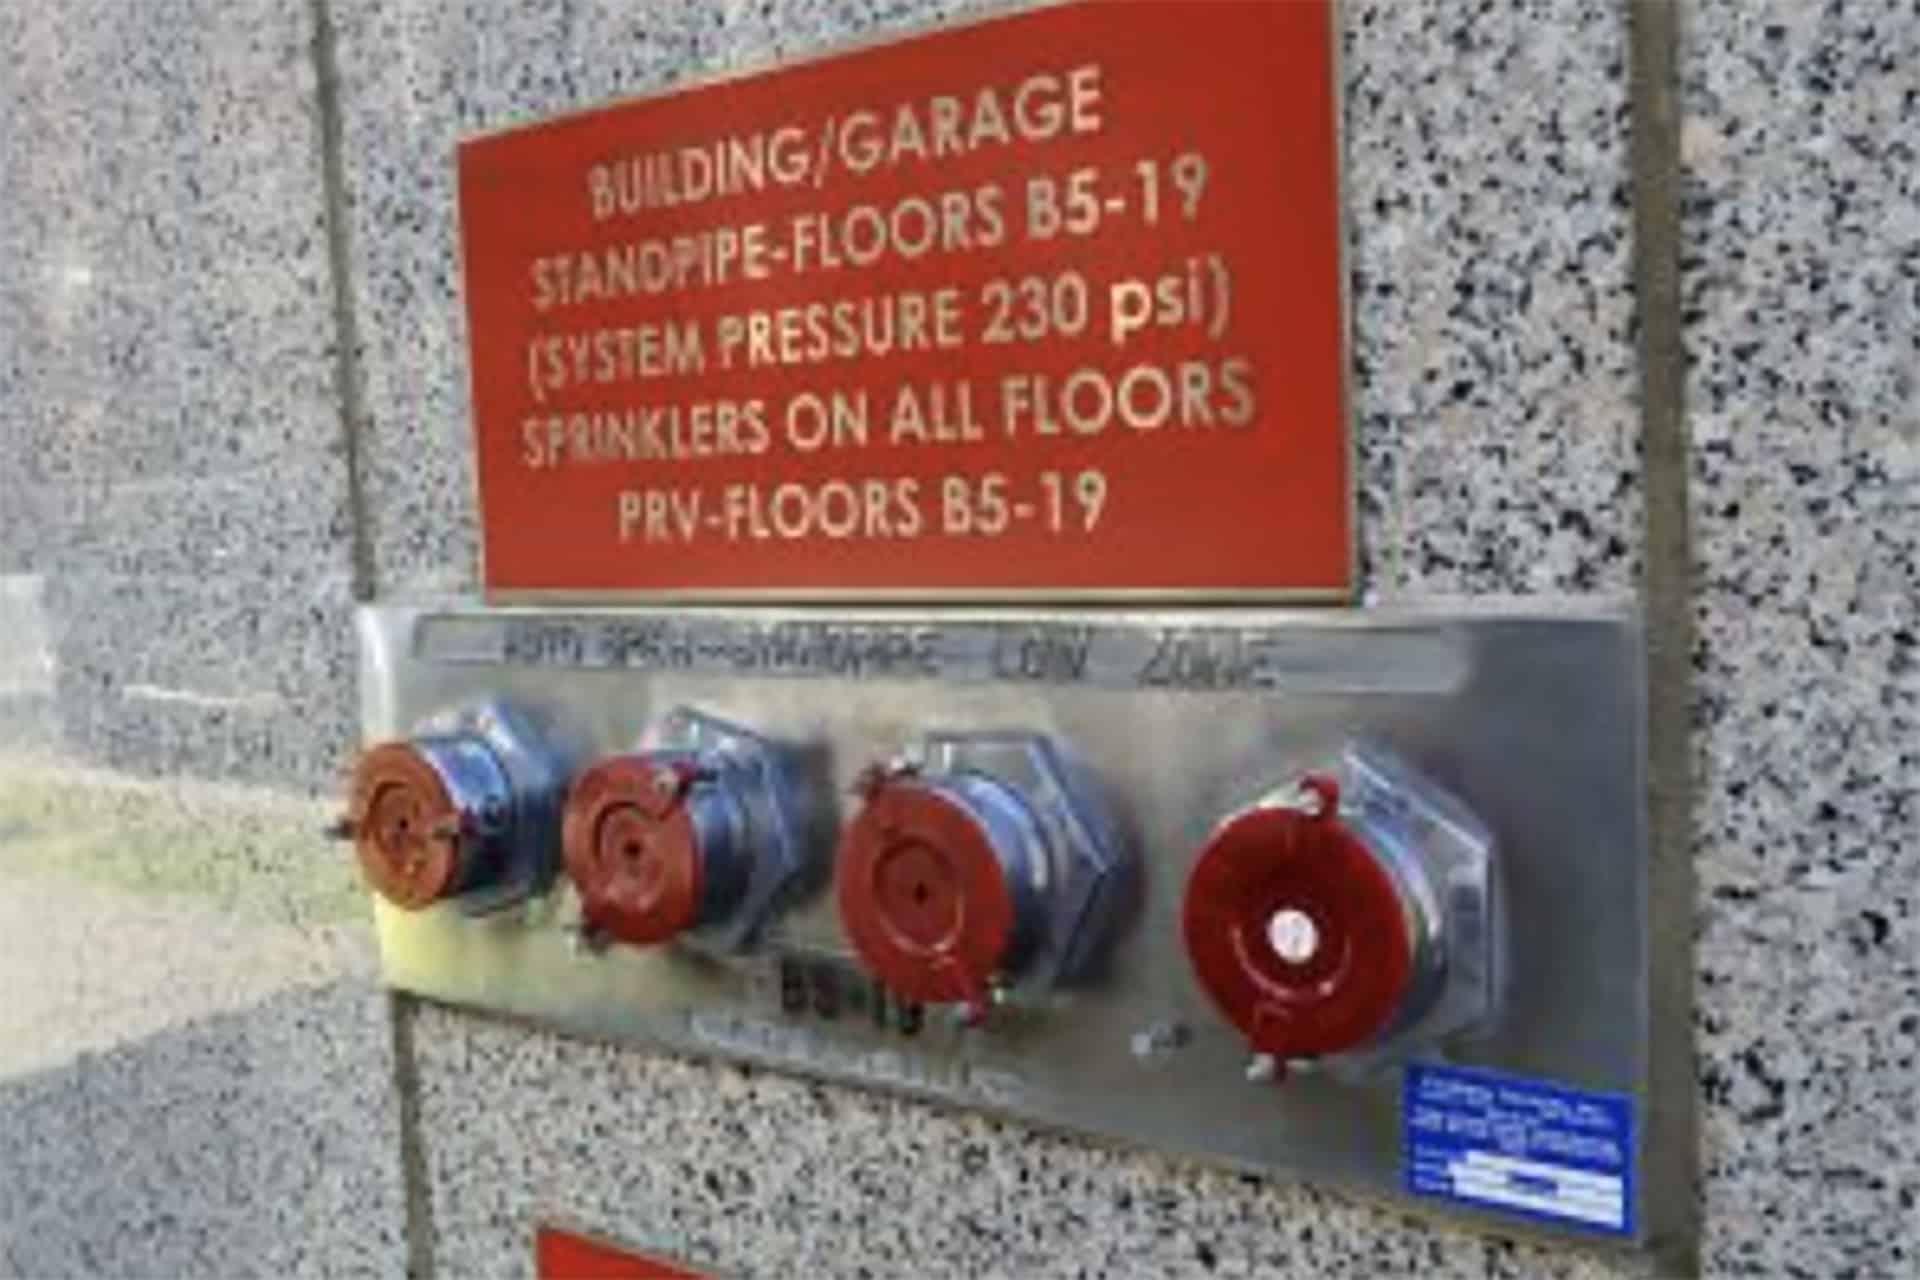 fire alarm sprinkler control panel